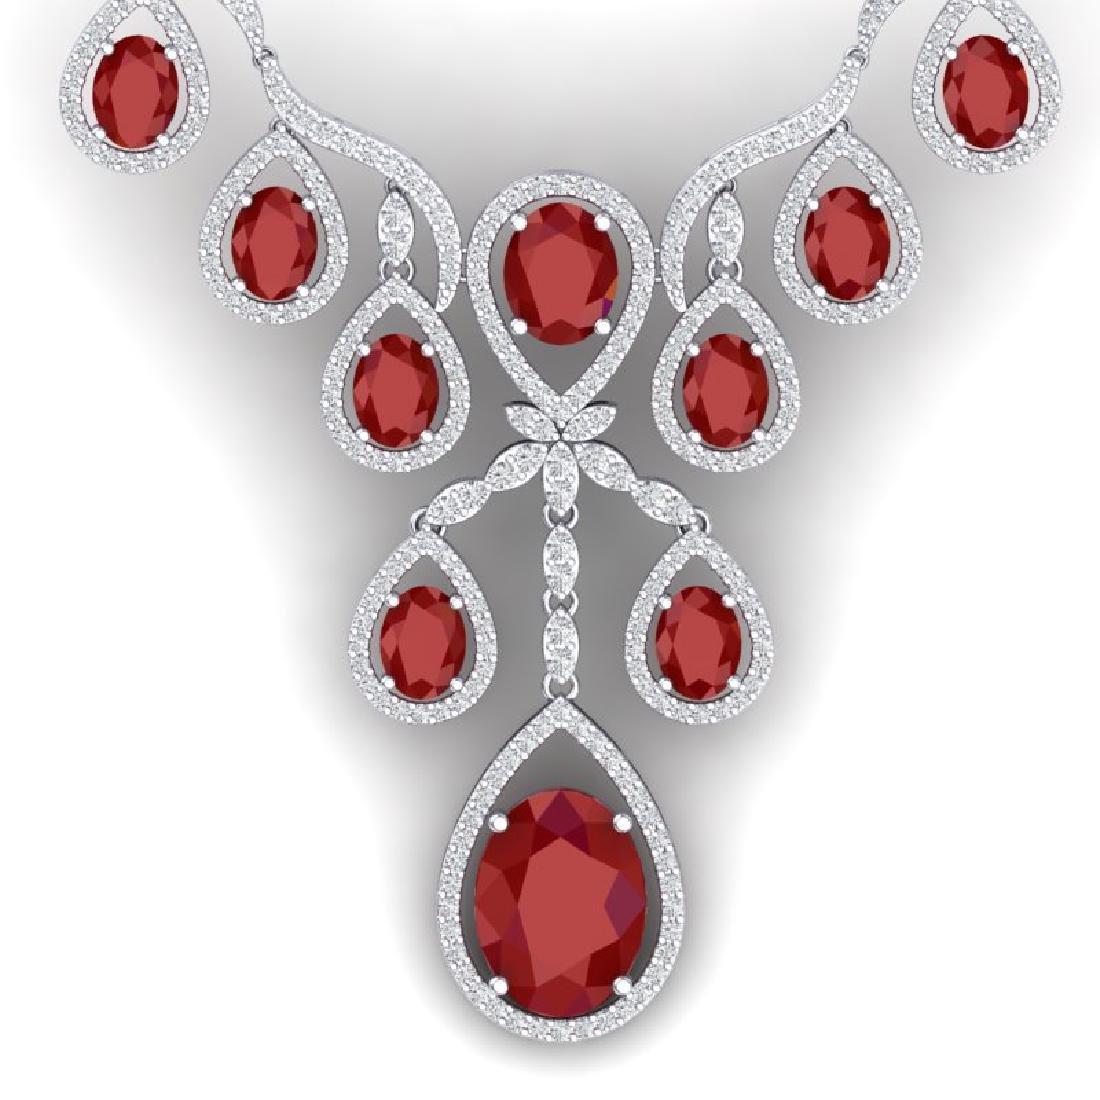 37.66 CTW Royalty Ruby & VS Diamond Necklace 18K White